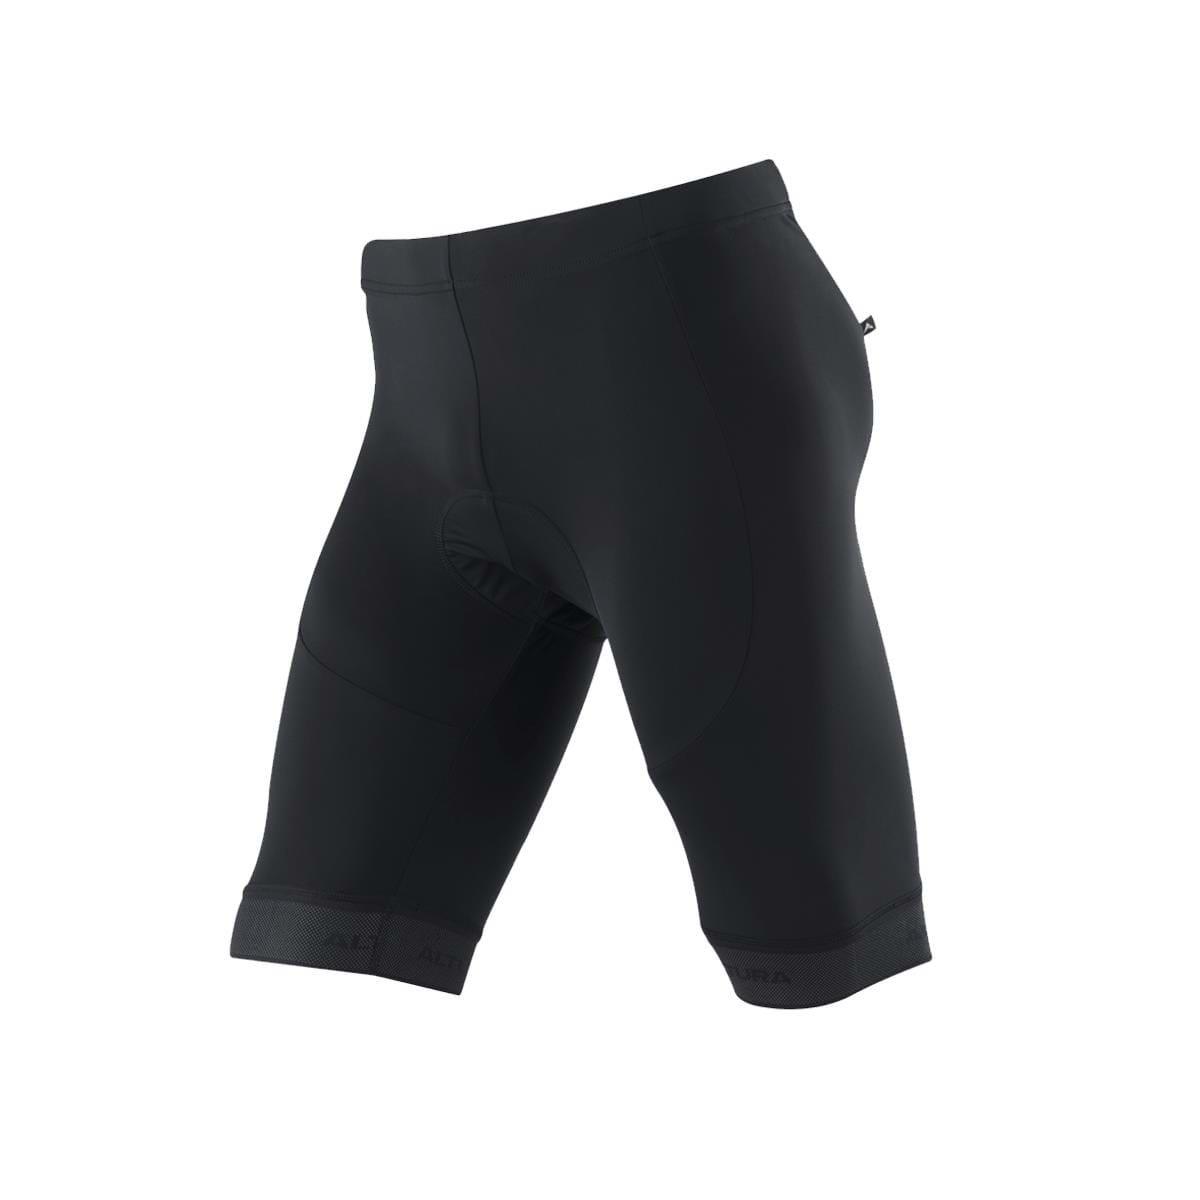 Progel Men's Waist Shorts